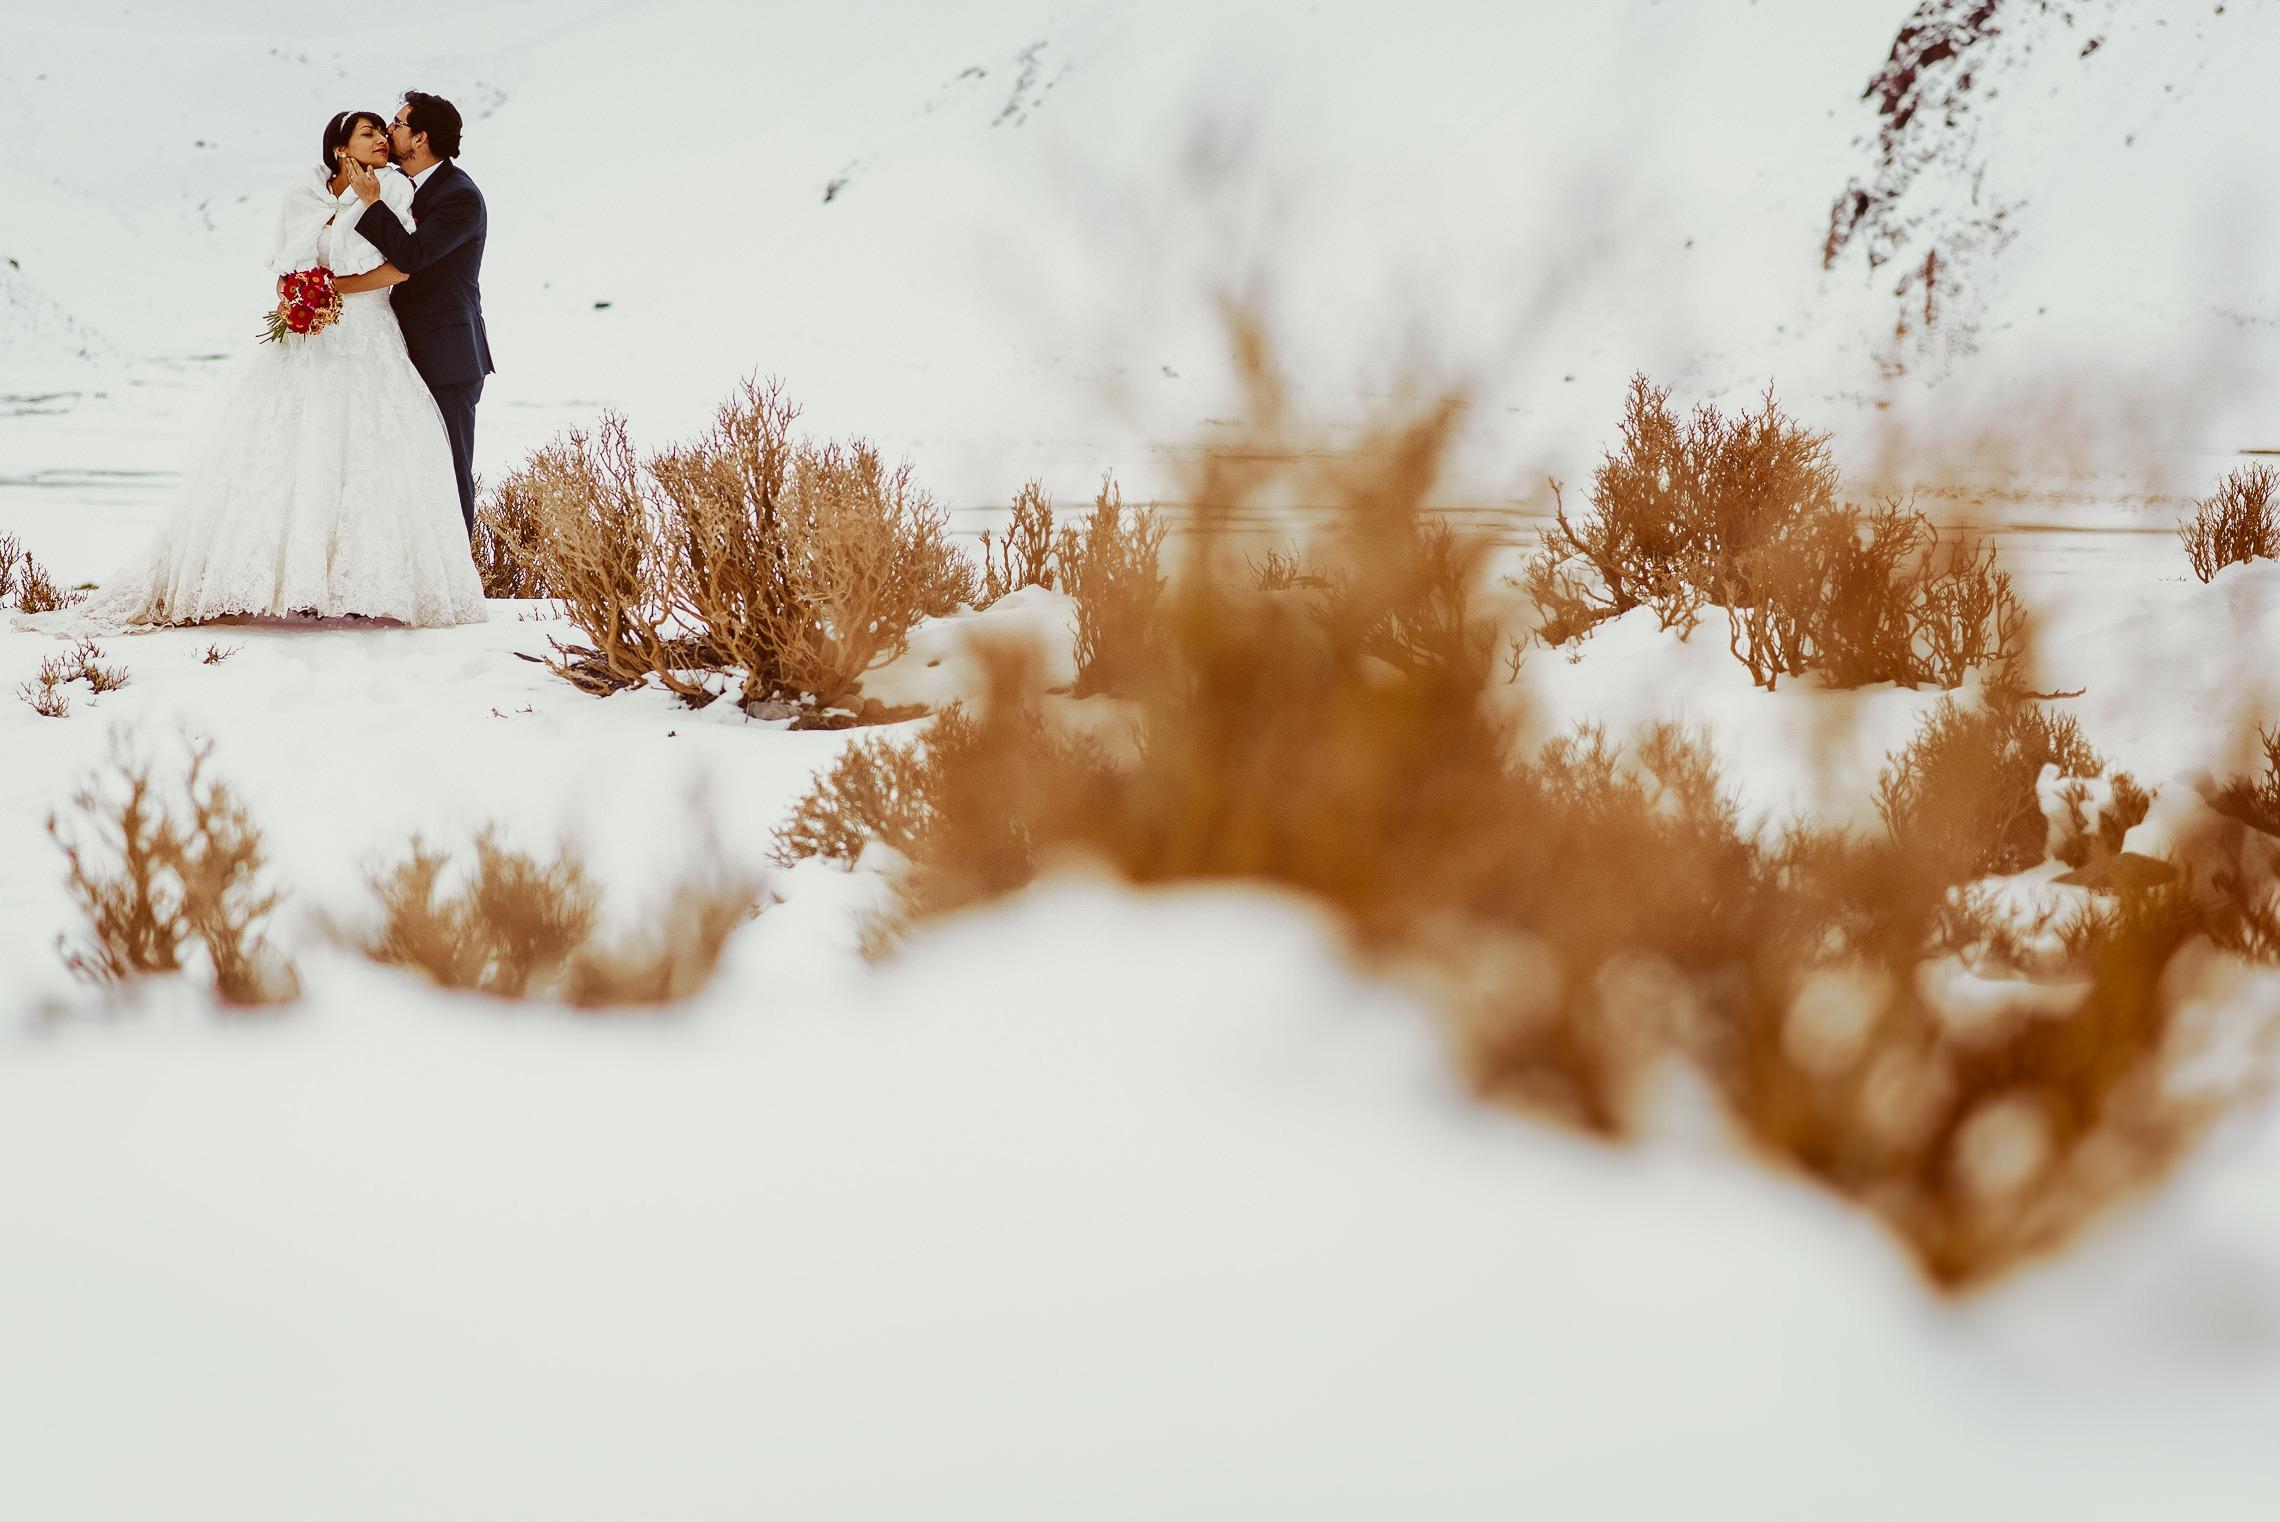 Postboda-trash-the-dress-destination-wedding-photographer-fotografo-matrimonios-fotografia-embalse-del-yeso 03